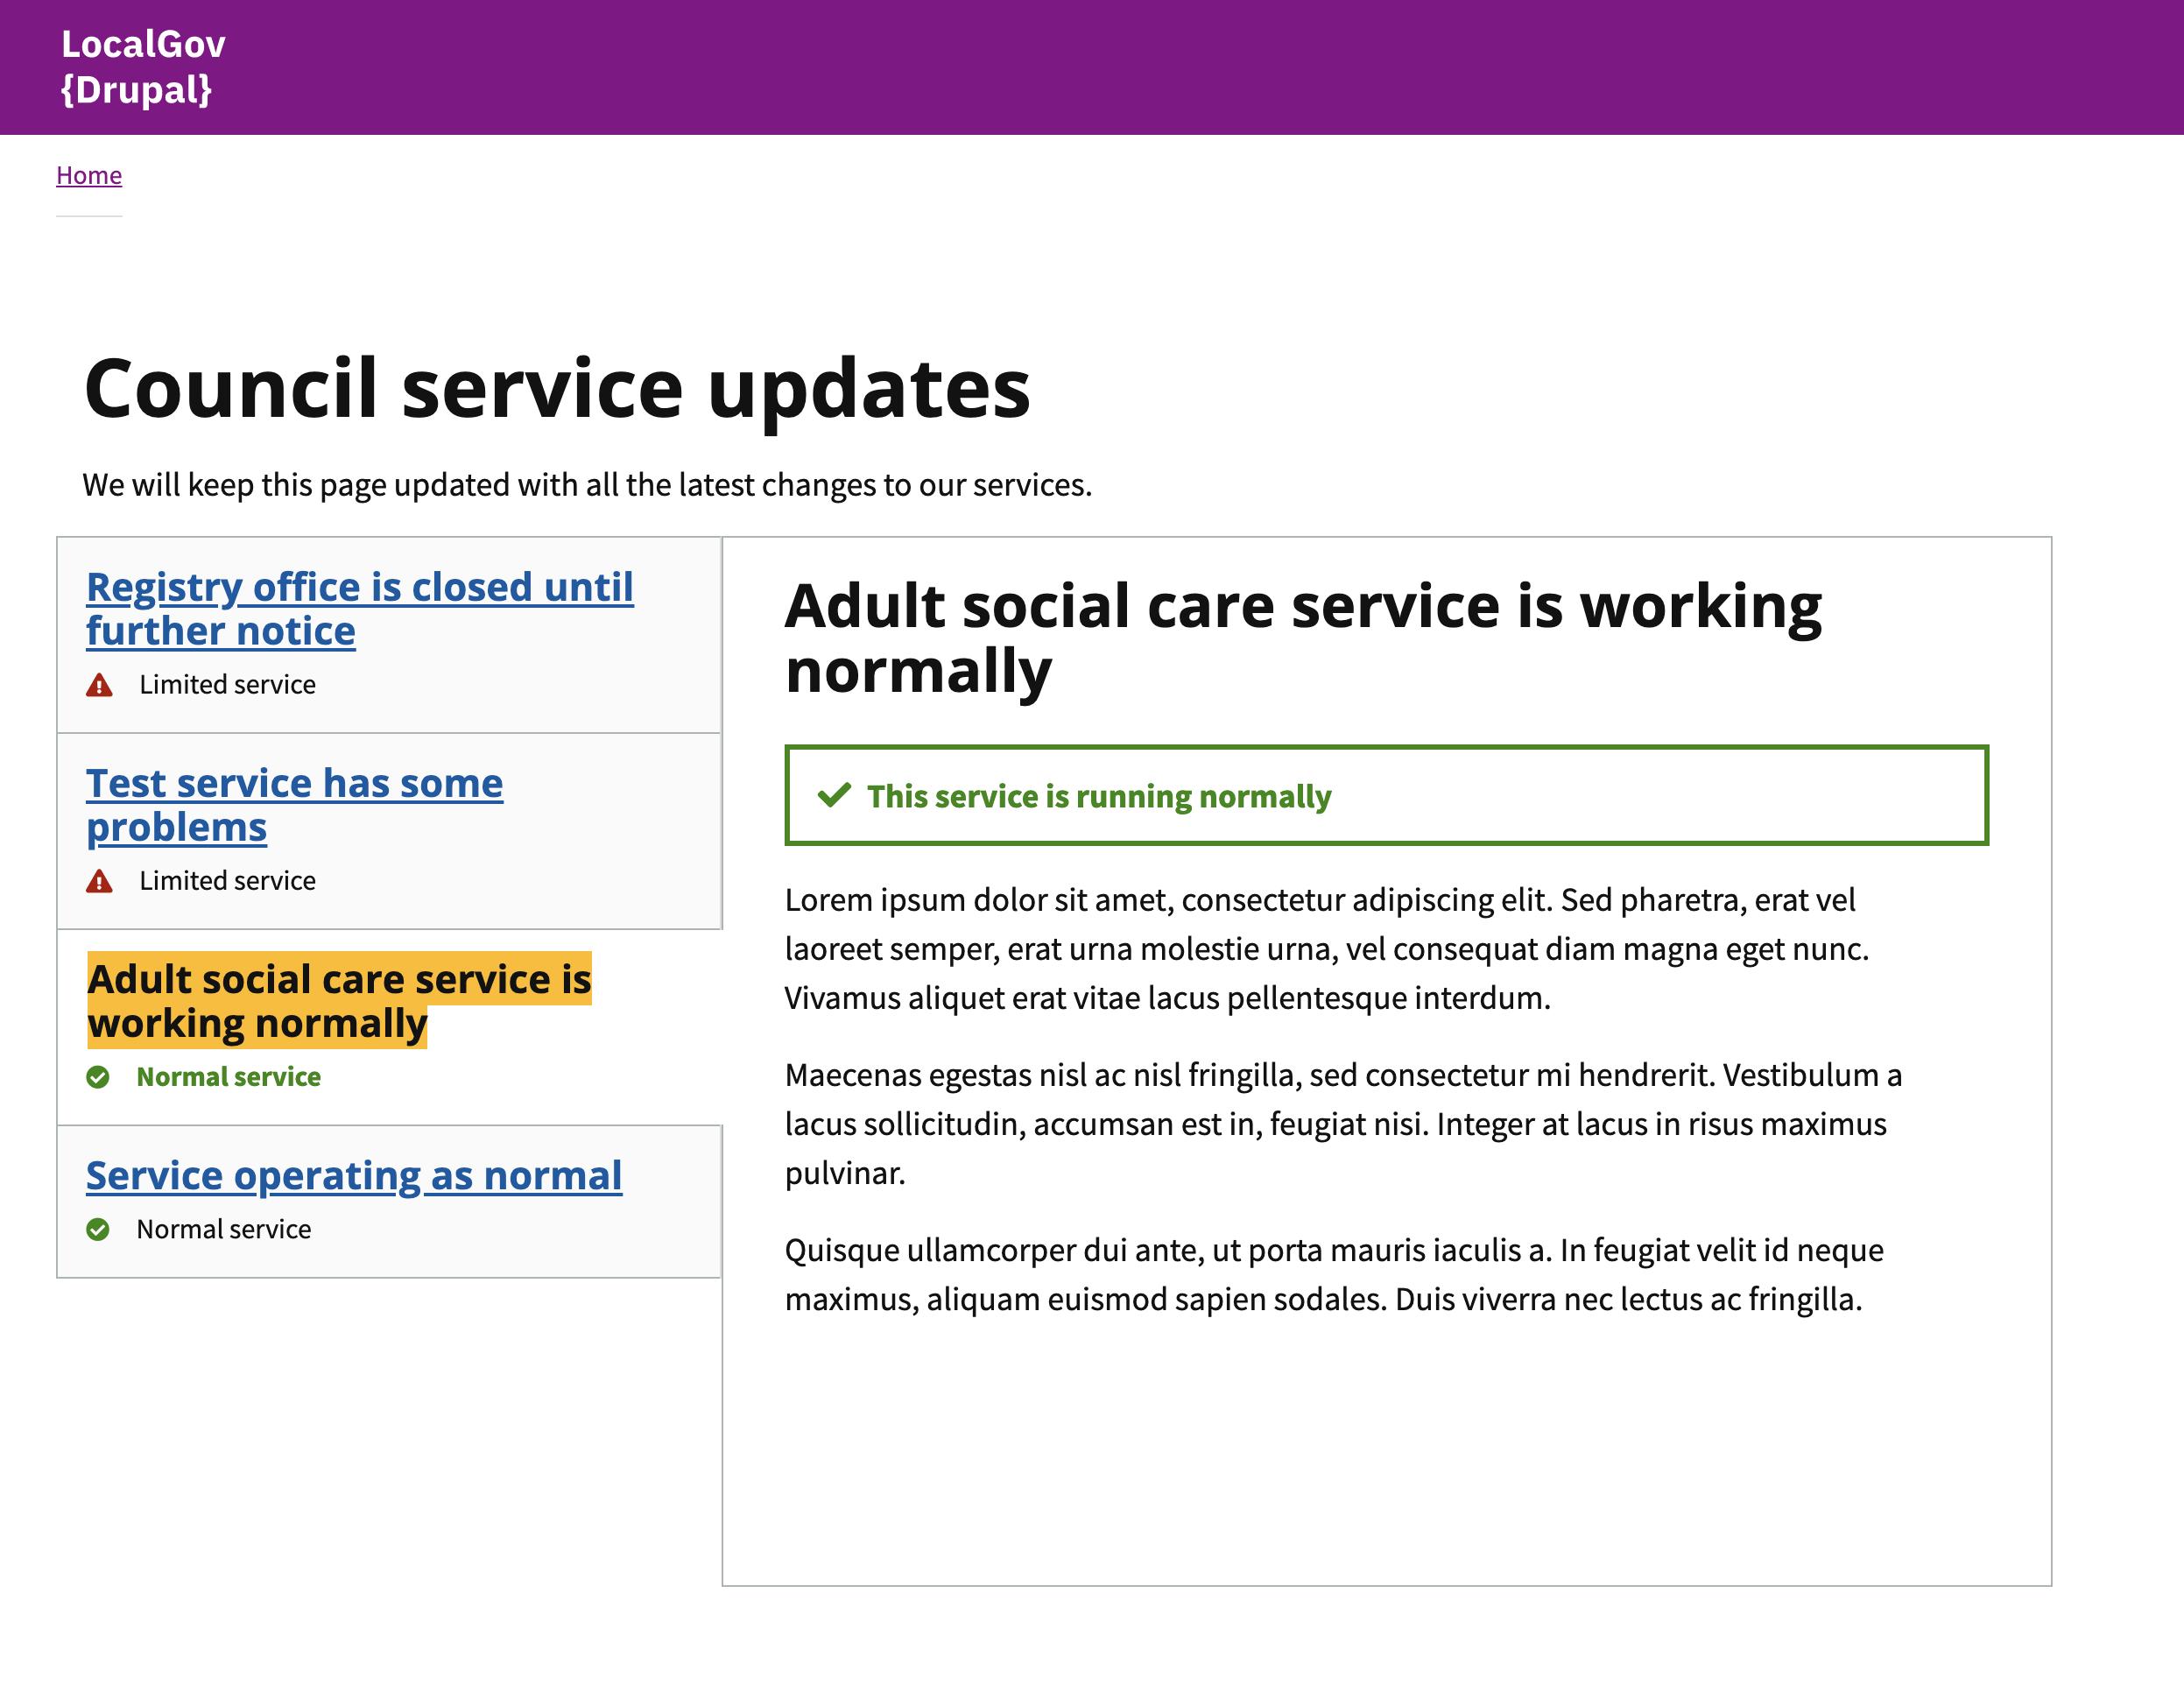 LocalGov Drupal service status